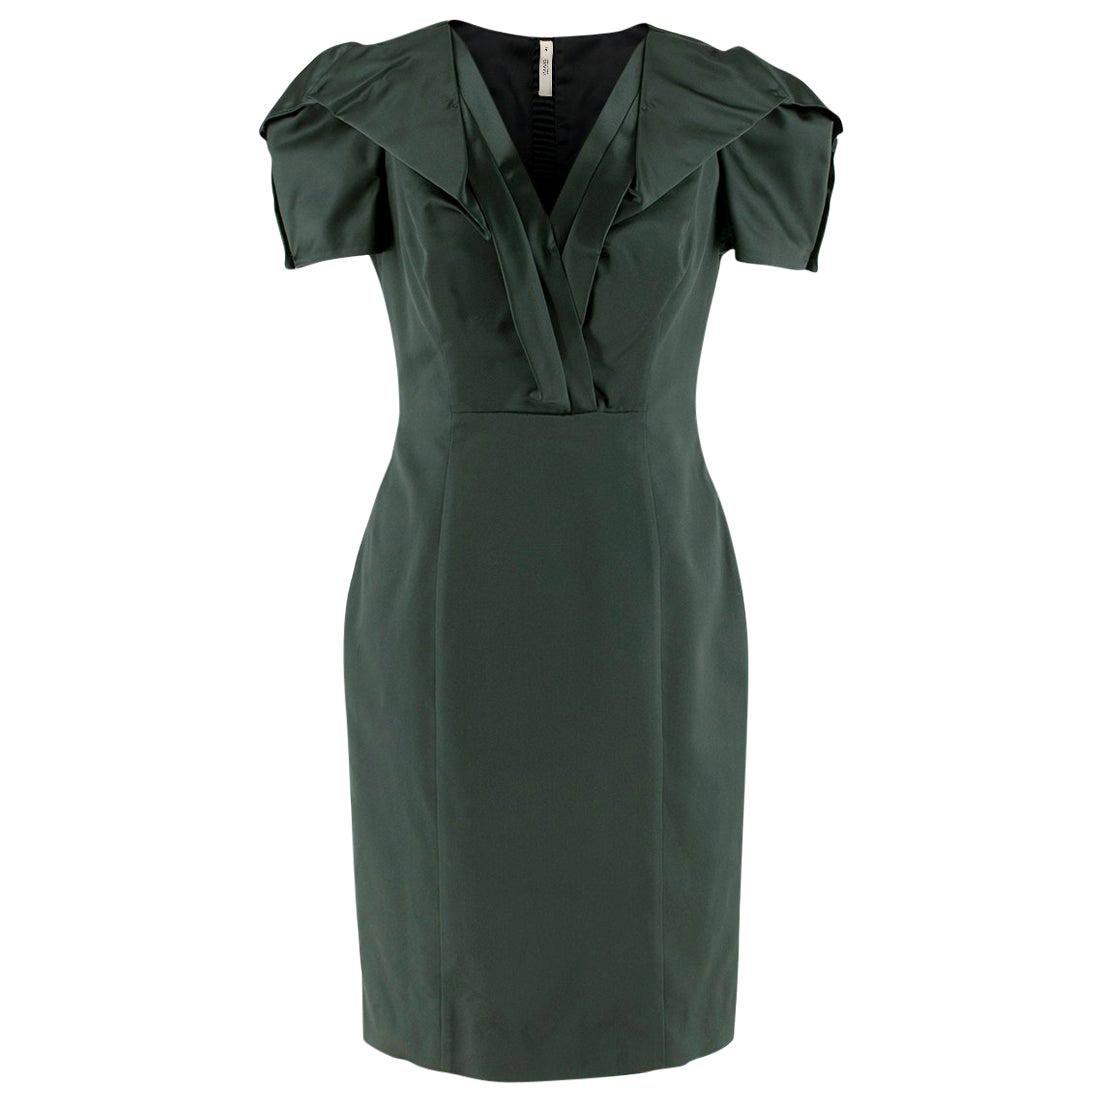 Prada Green Duchess-Satin Dress - Size US 6